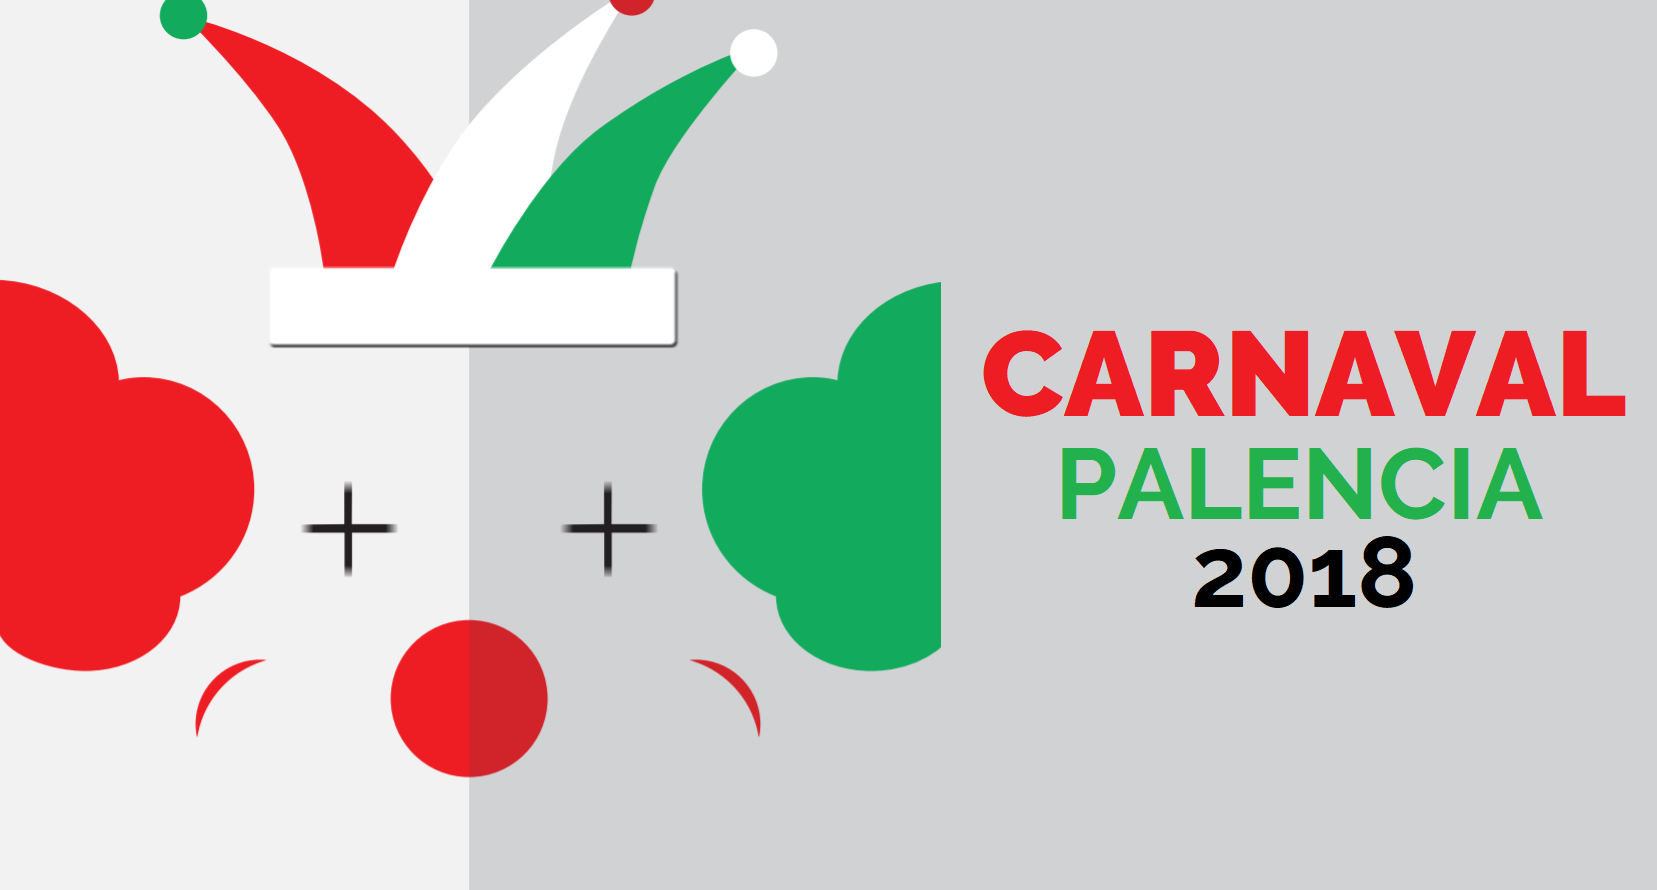 carnaval palencia 2018